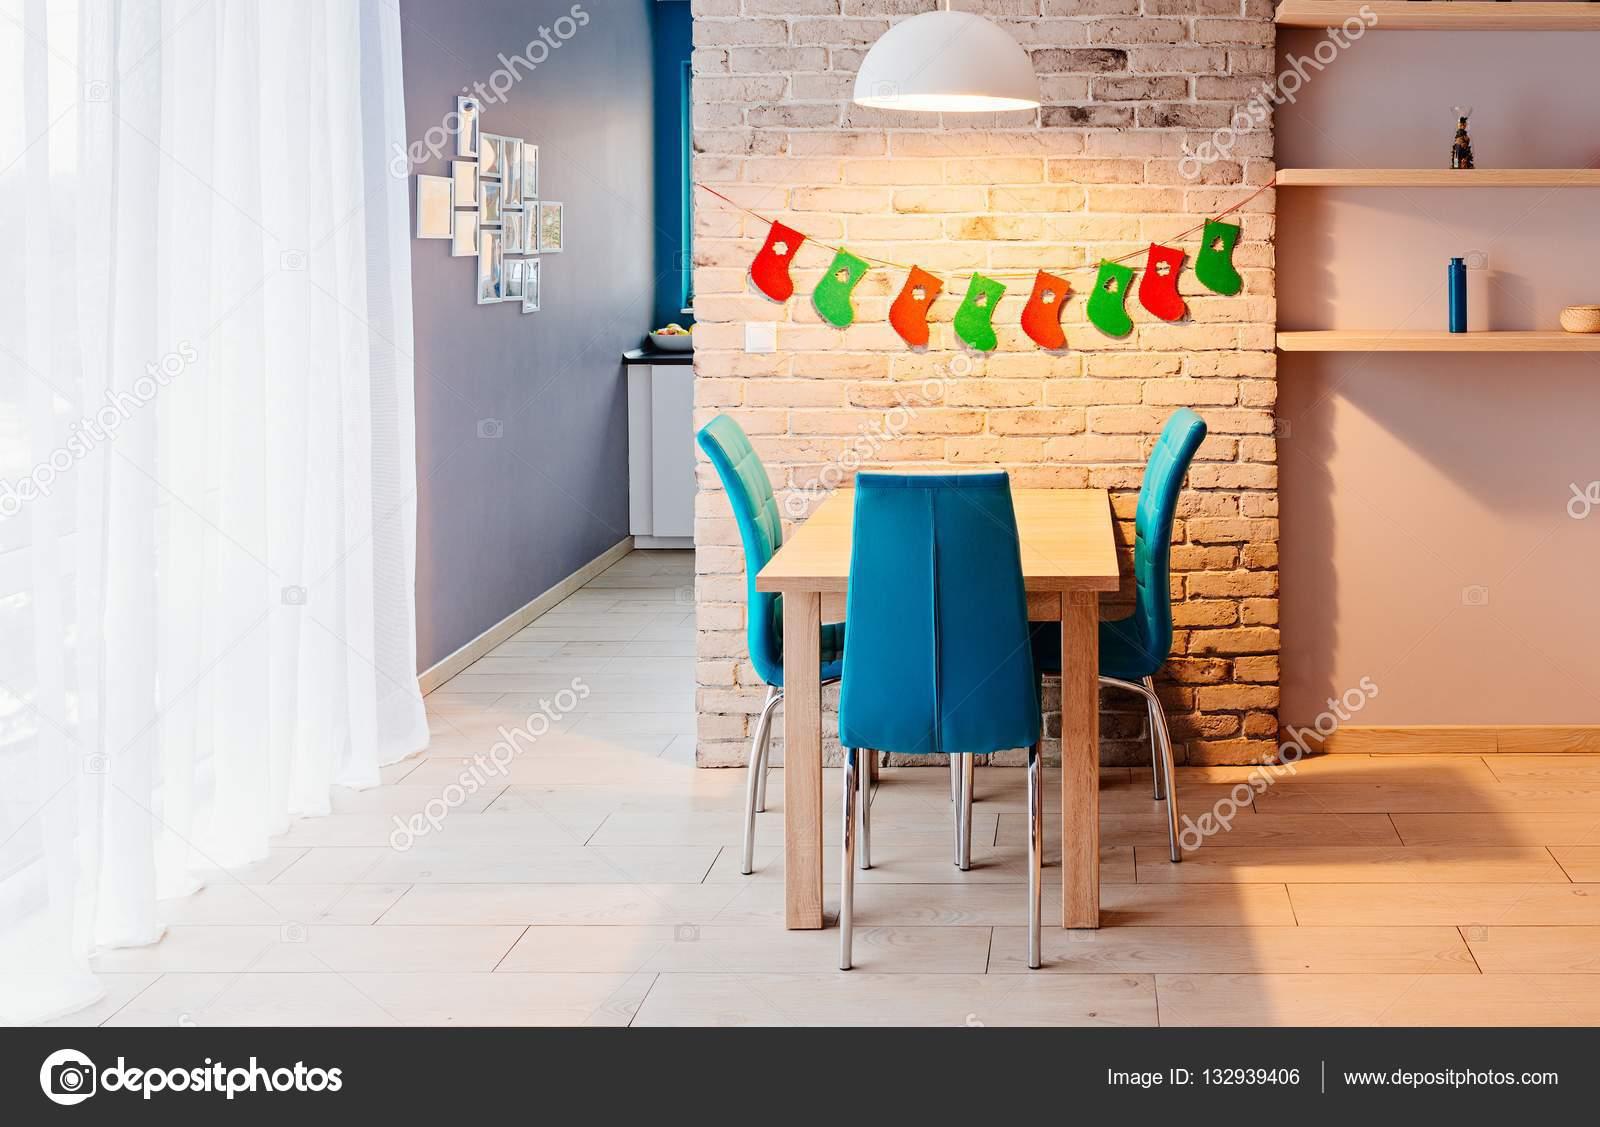 Eetkamer met kerstdecoratie u stockfoto djedzura